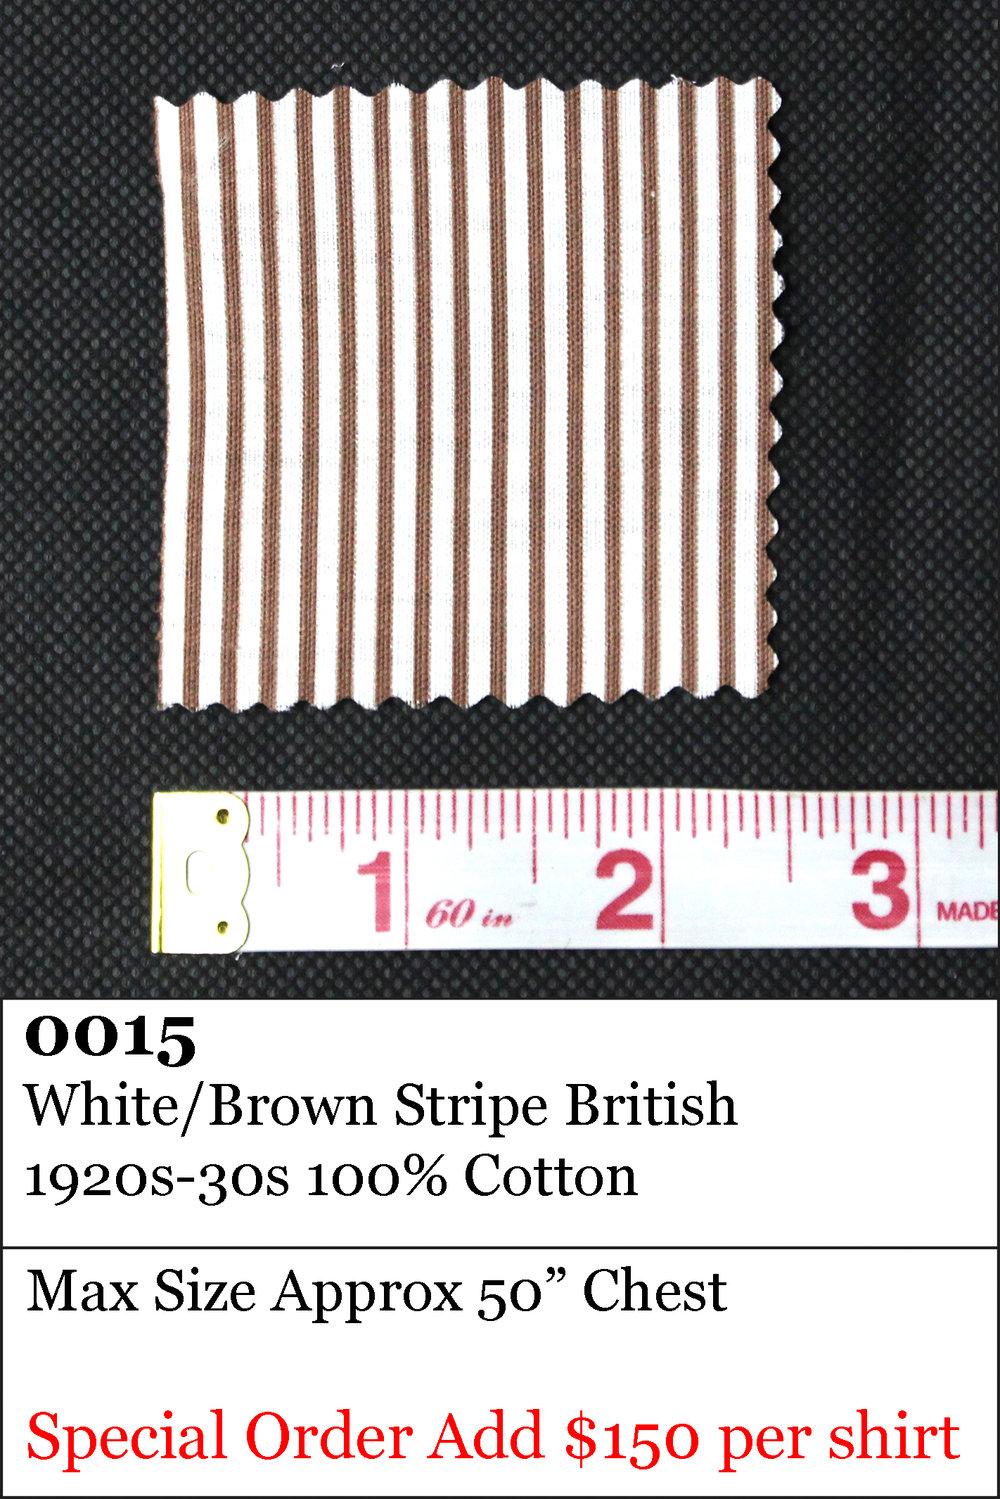 Fabric0015.jpg